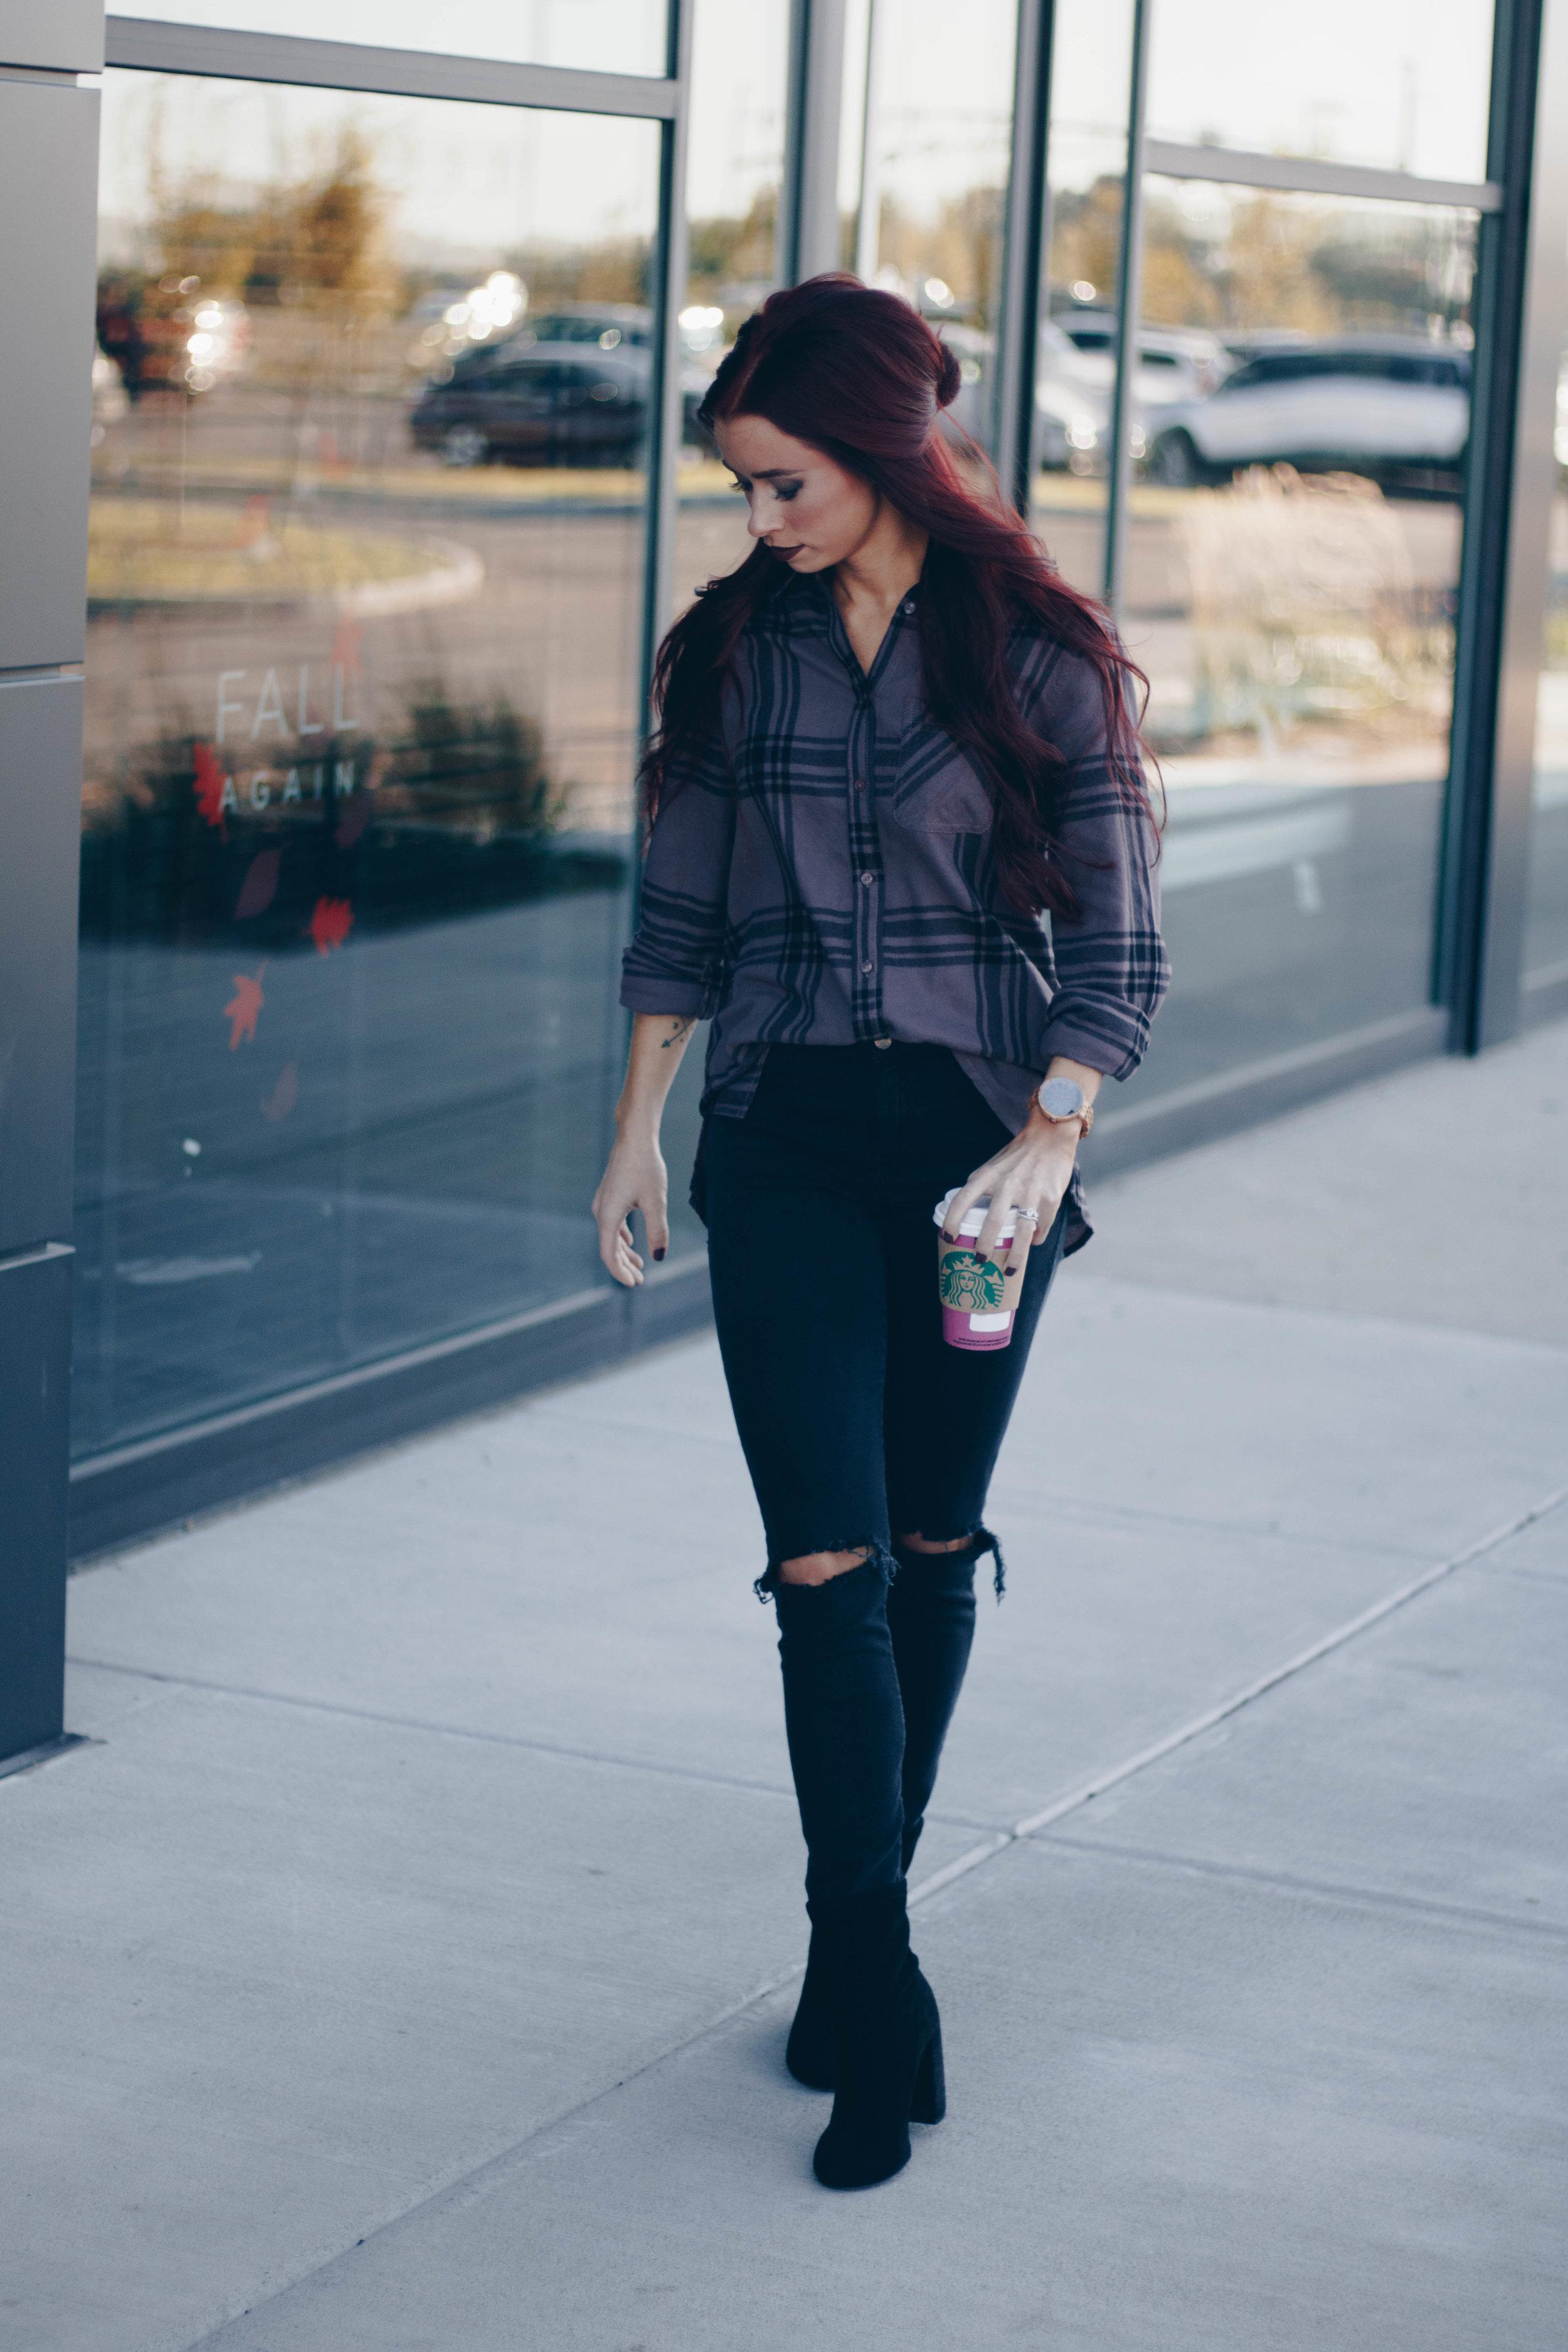 Flannel Shirt  ||  JORD Watch (Use code TRENDYININDY50 for $50 off) ||  Black Denim  ||  Black Booties  ||  Makeup